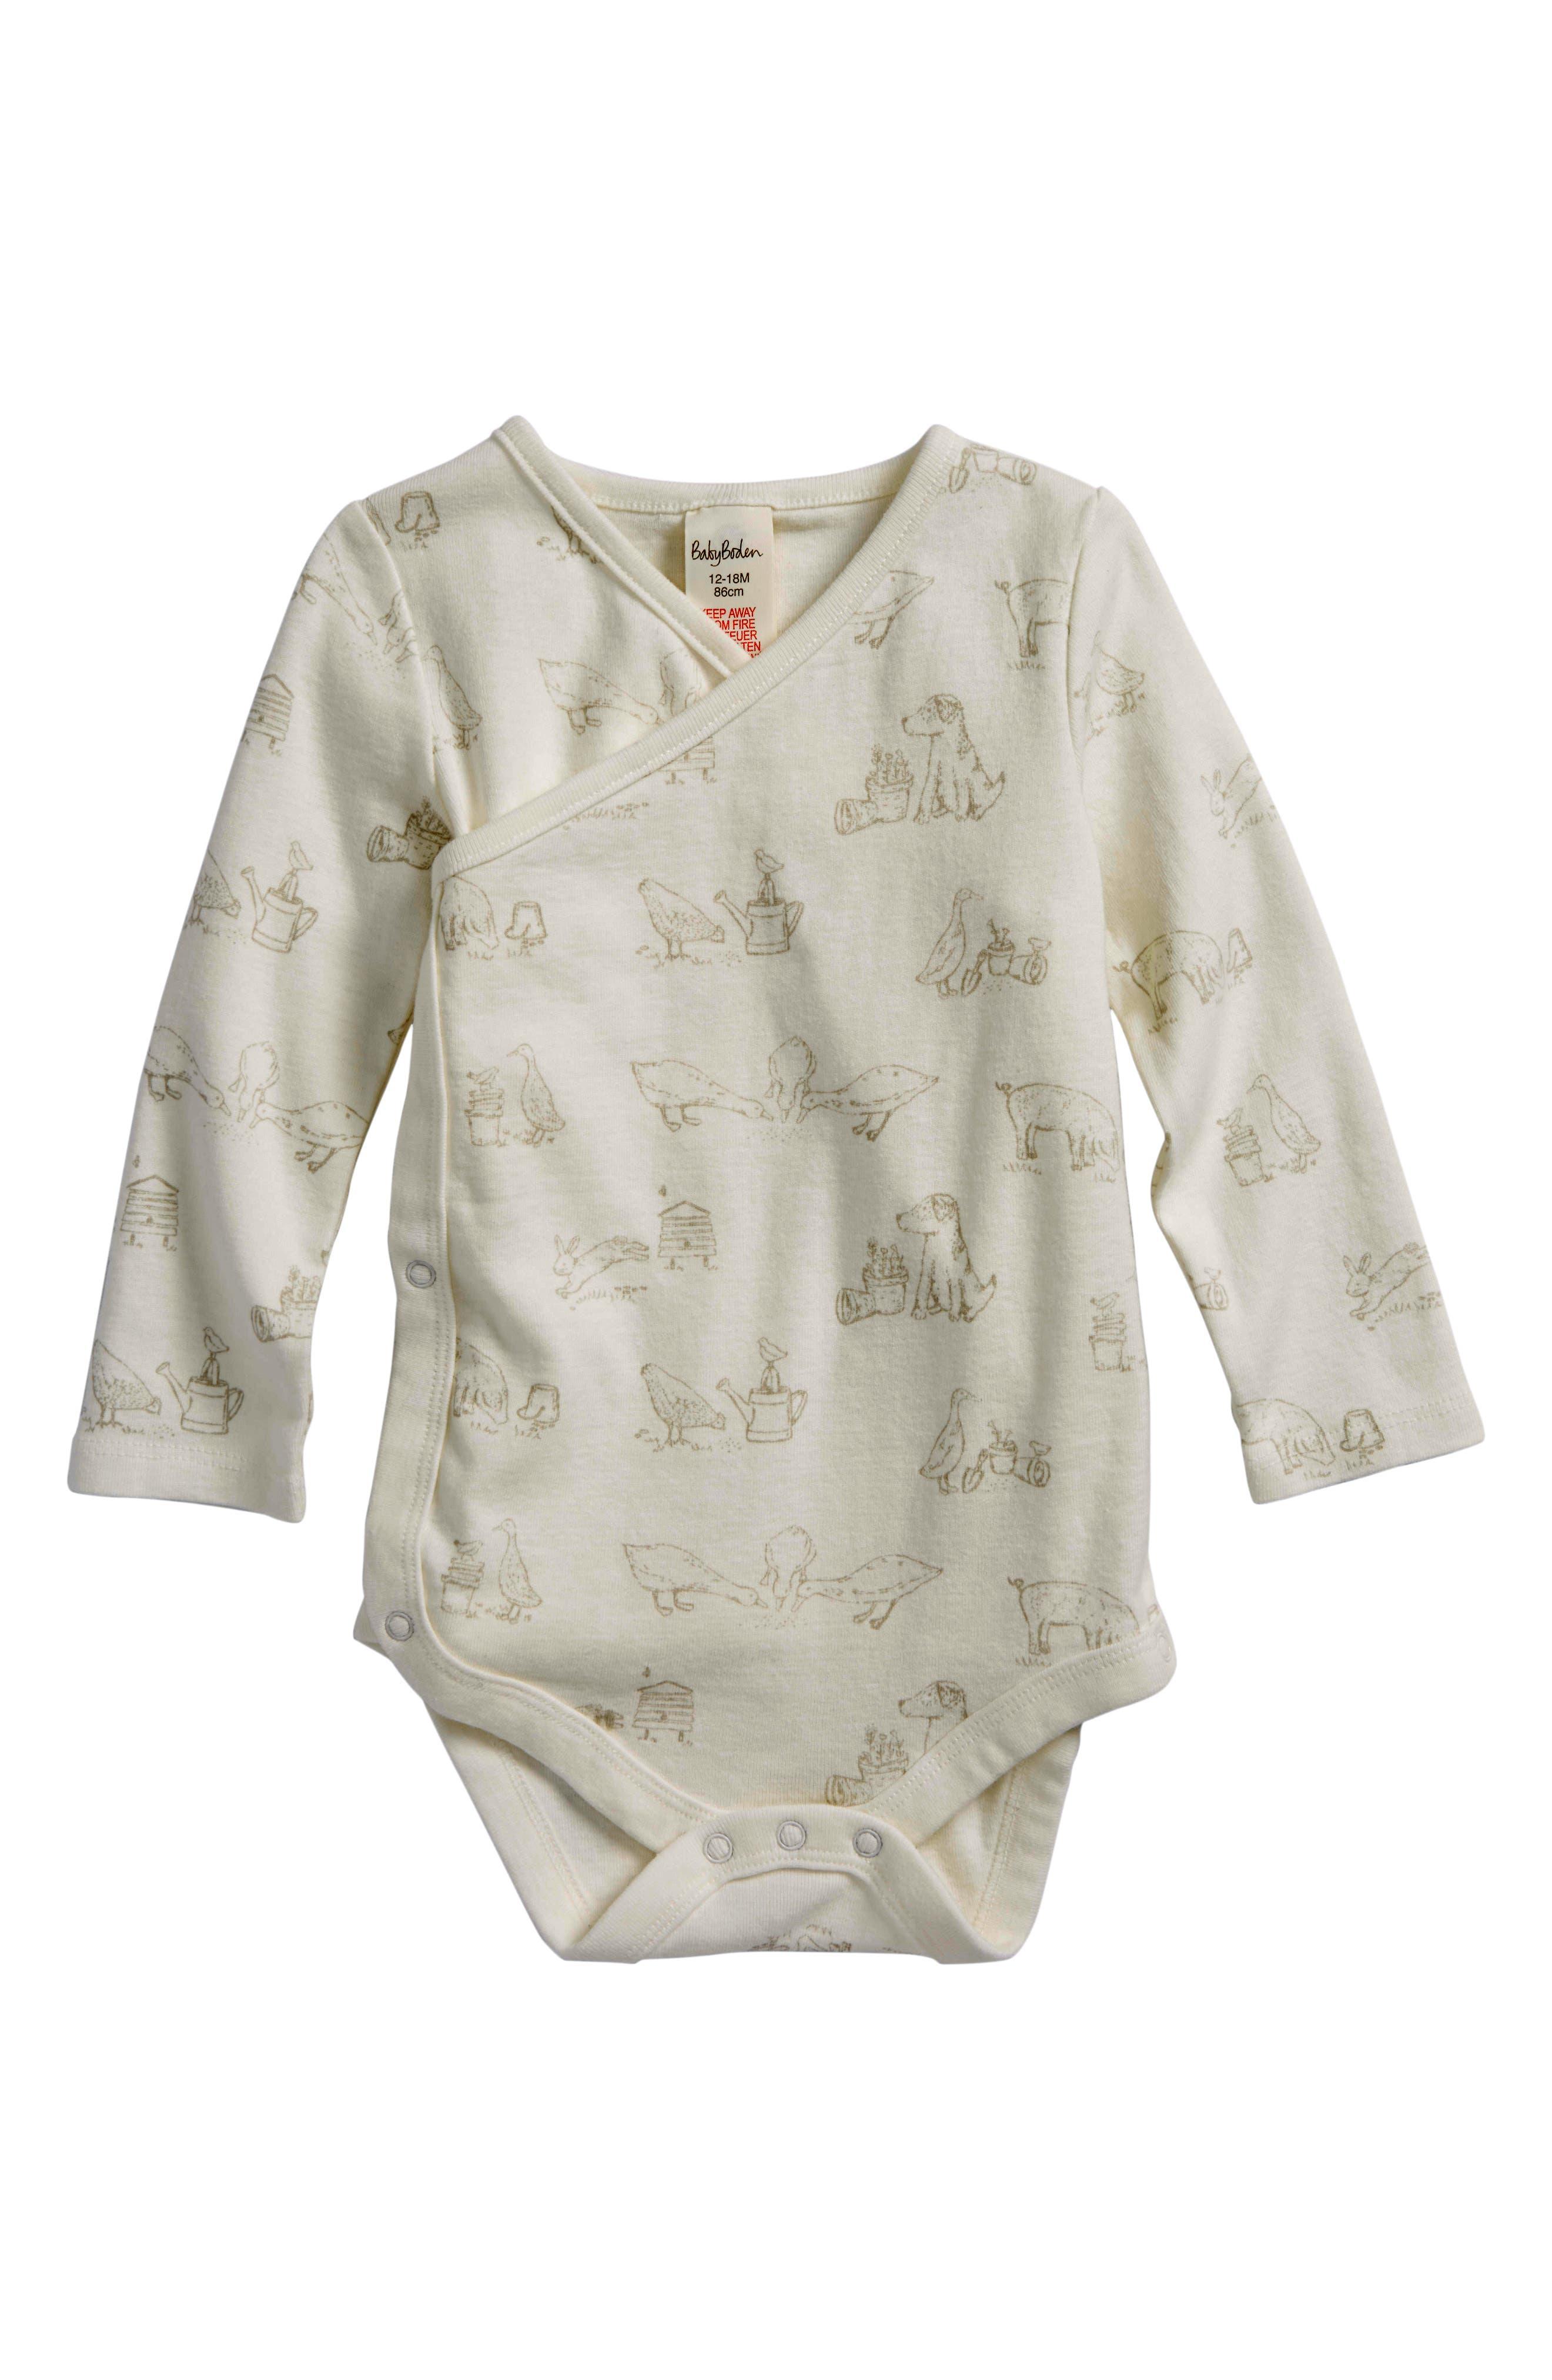 MINI BODEN Farmyard Organic Cotton Wrap Bodysuit, Main, color, SHALE GREY